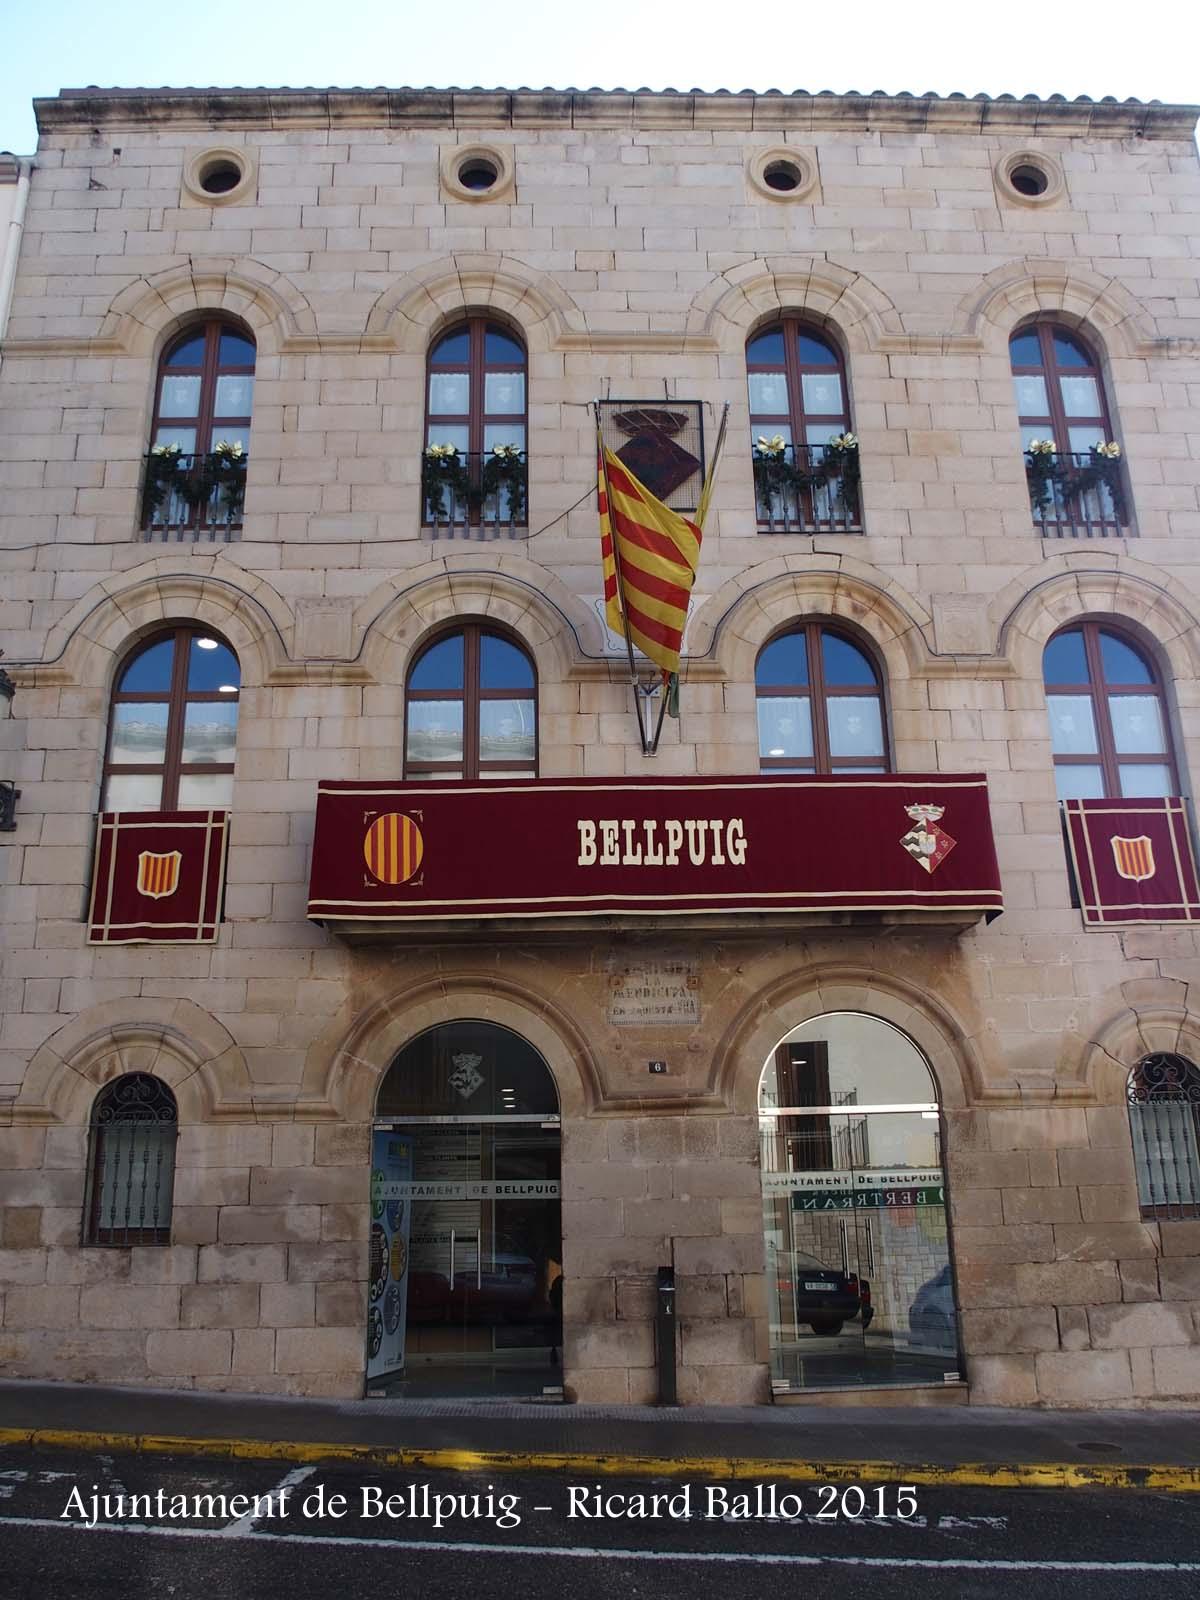 Ajuntament de Bellpuig